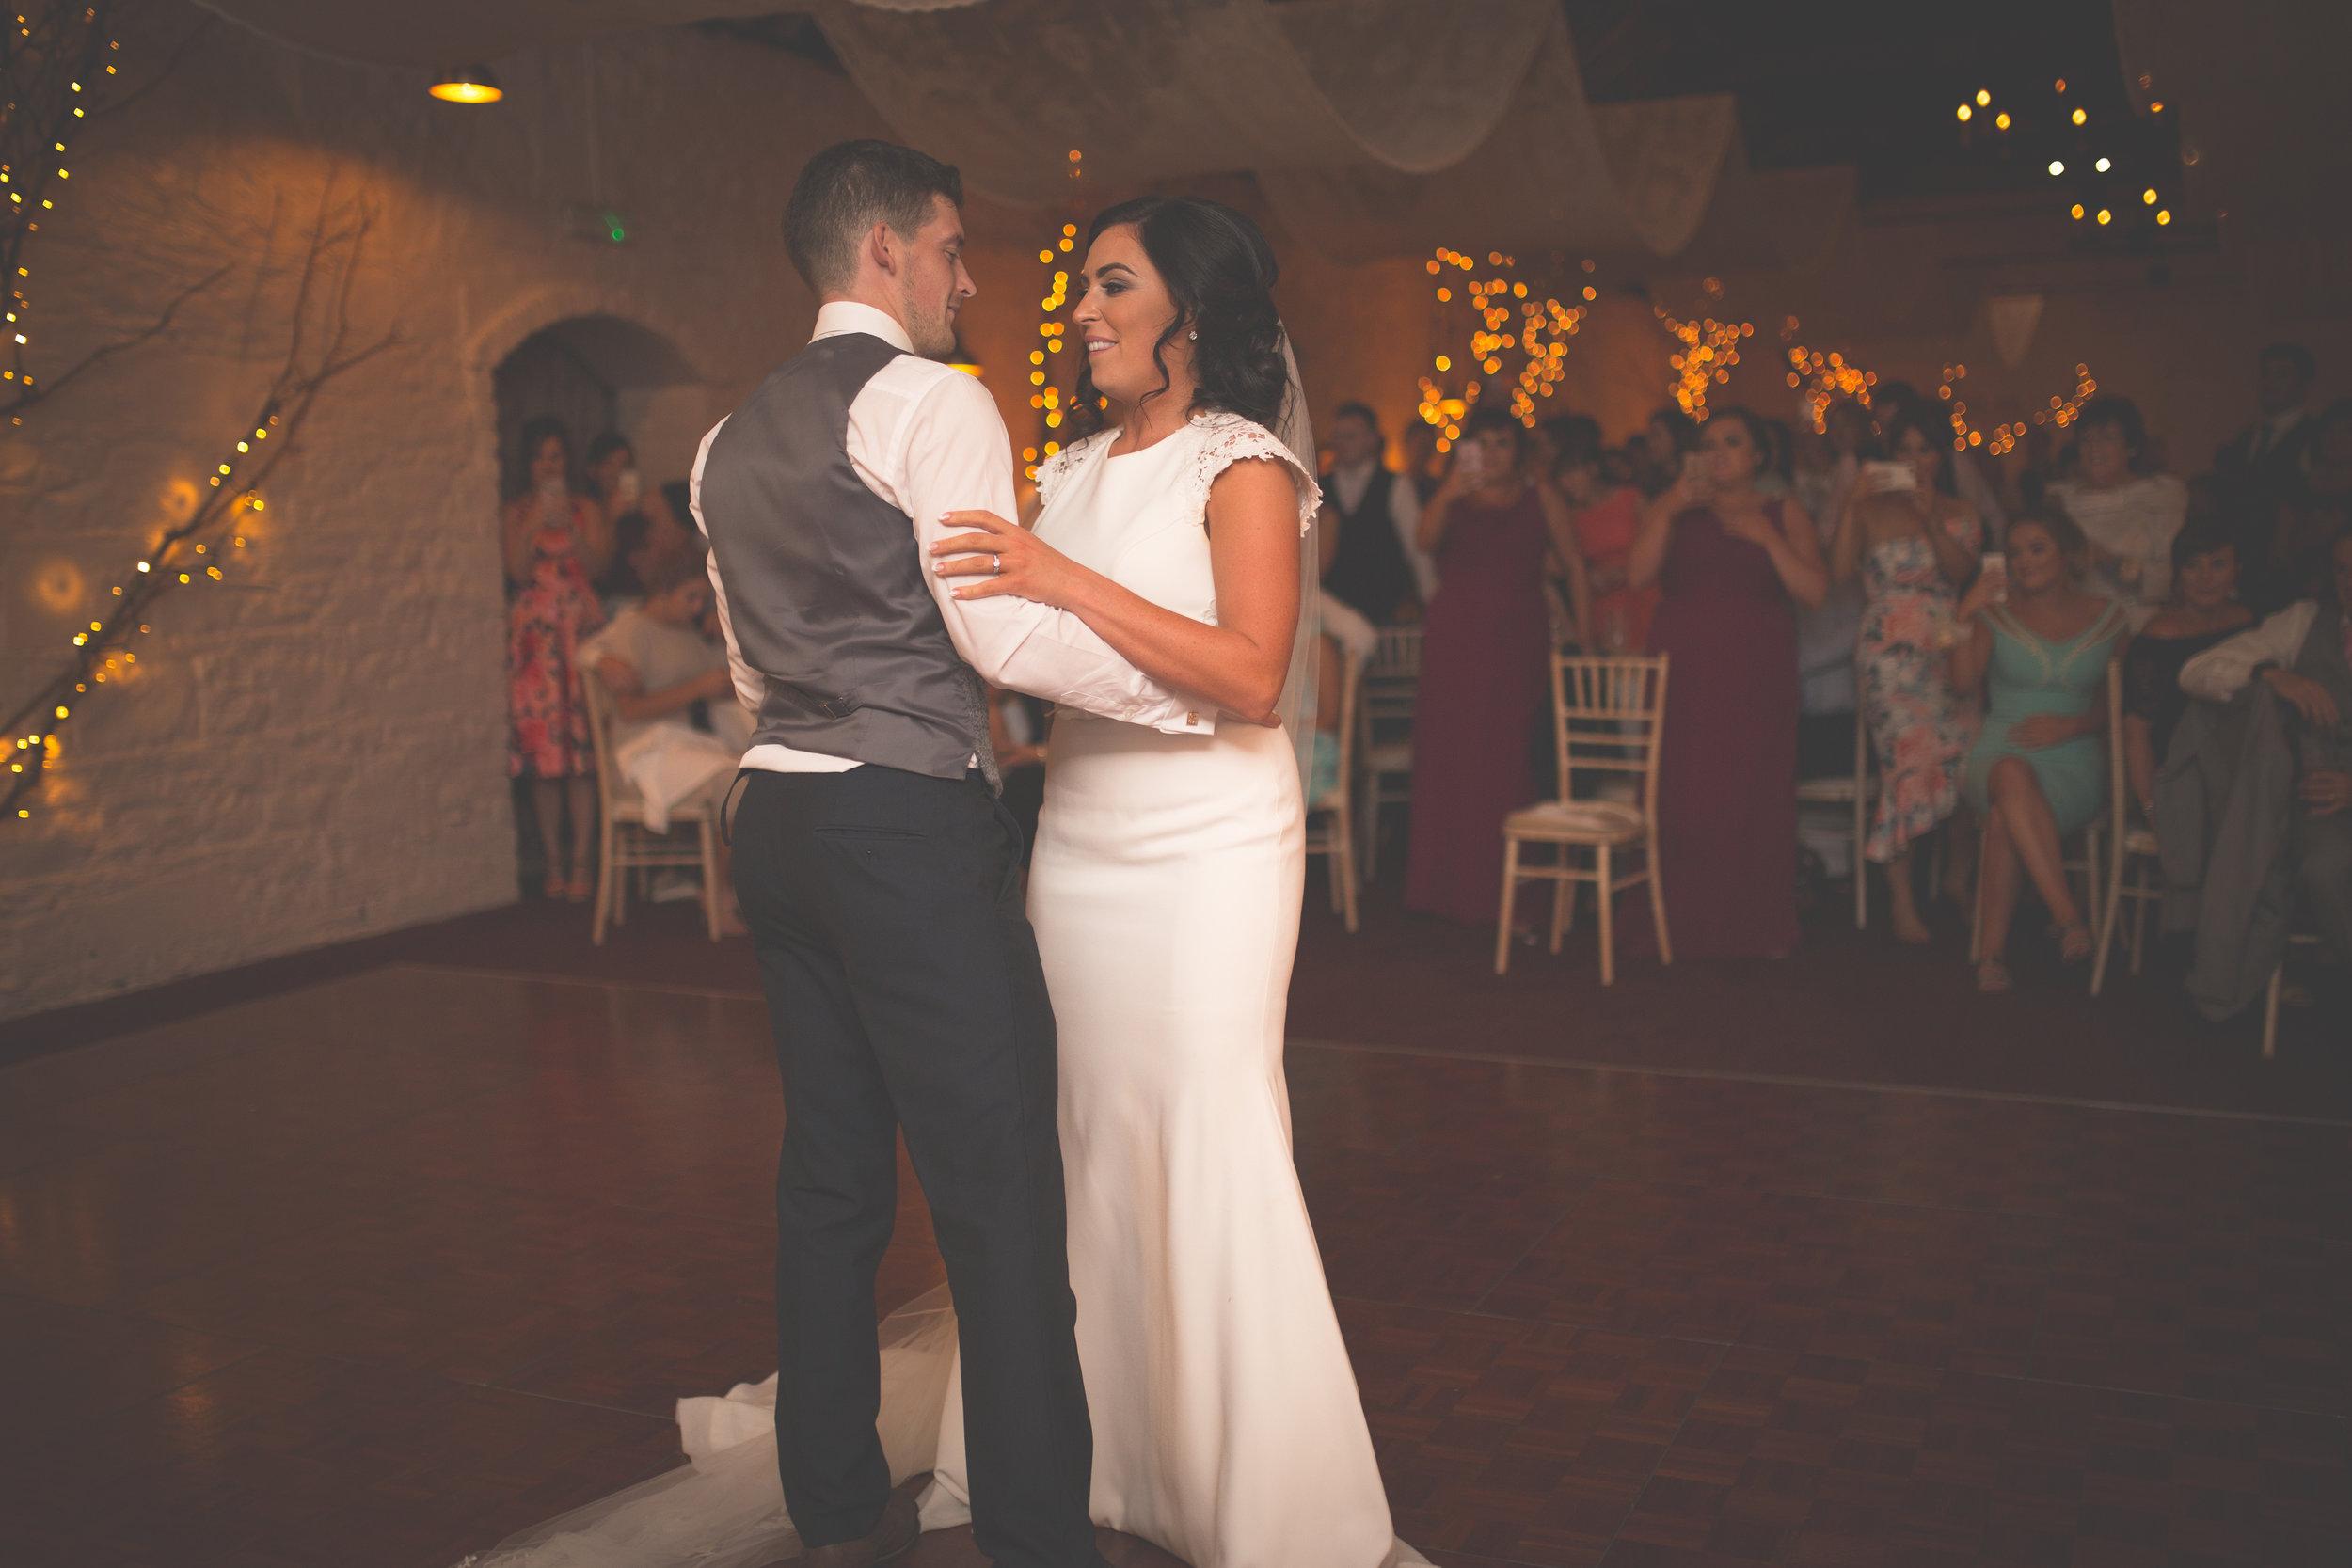 Brian McEwan Wedding Photography | Carol-Annee & Sean | The Dancing-25.jpg